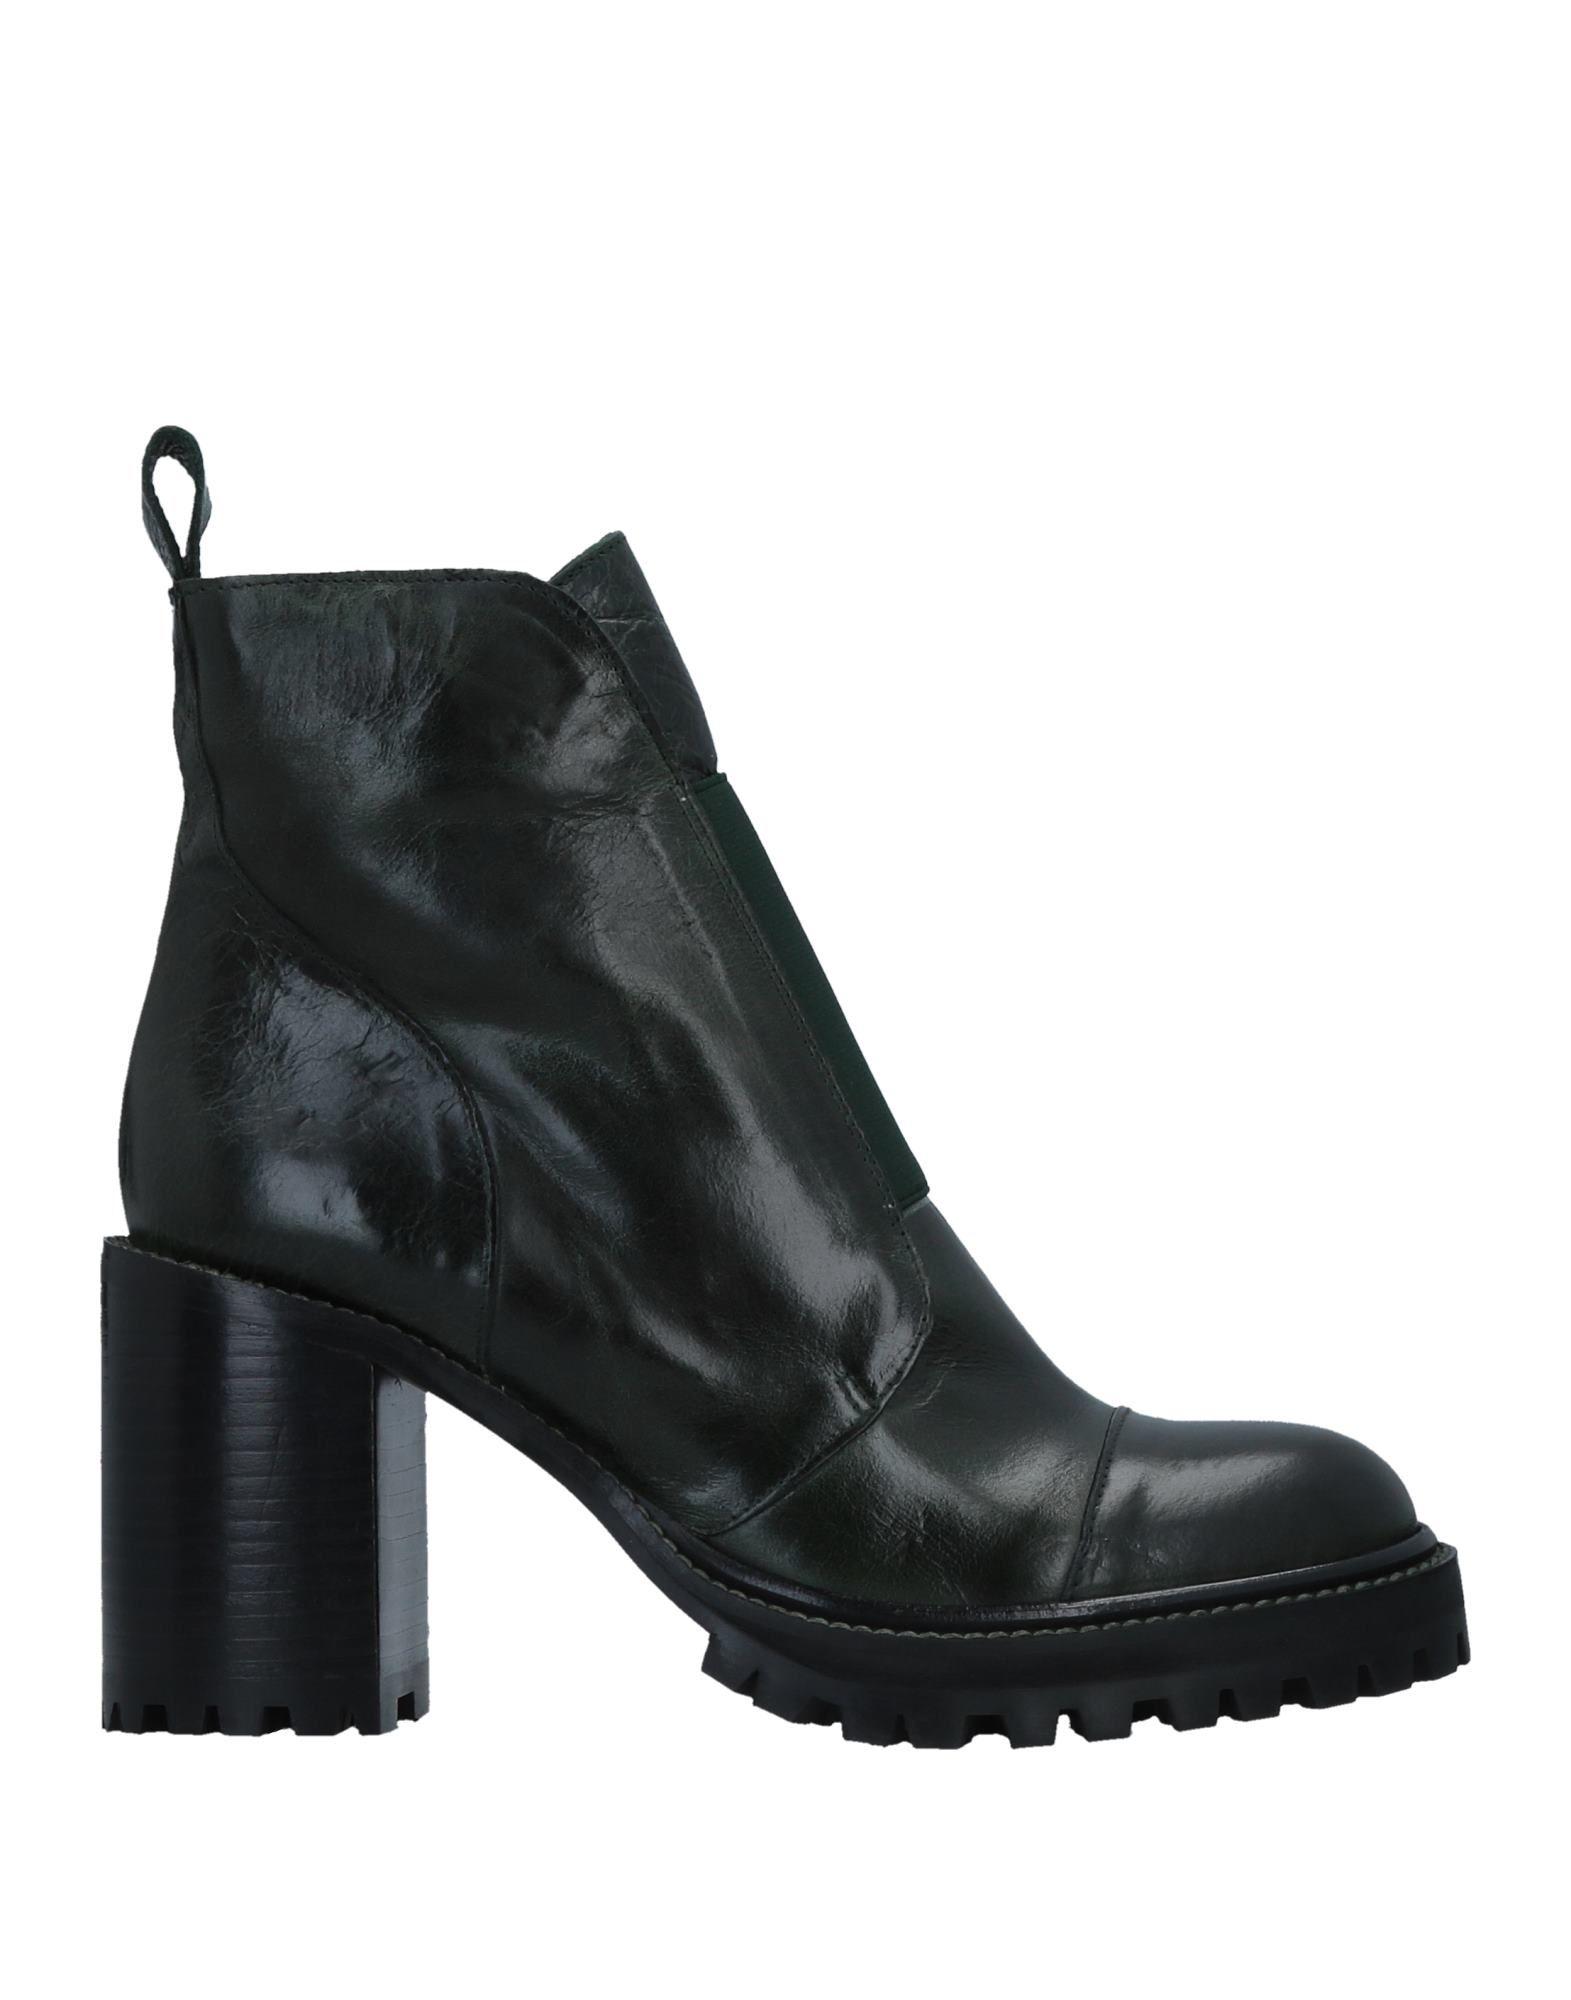 Moda Stivaletti Ras Donna - 11511509LL